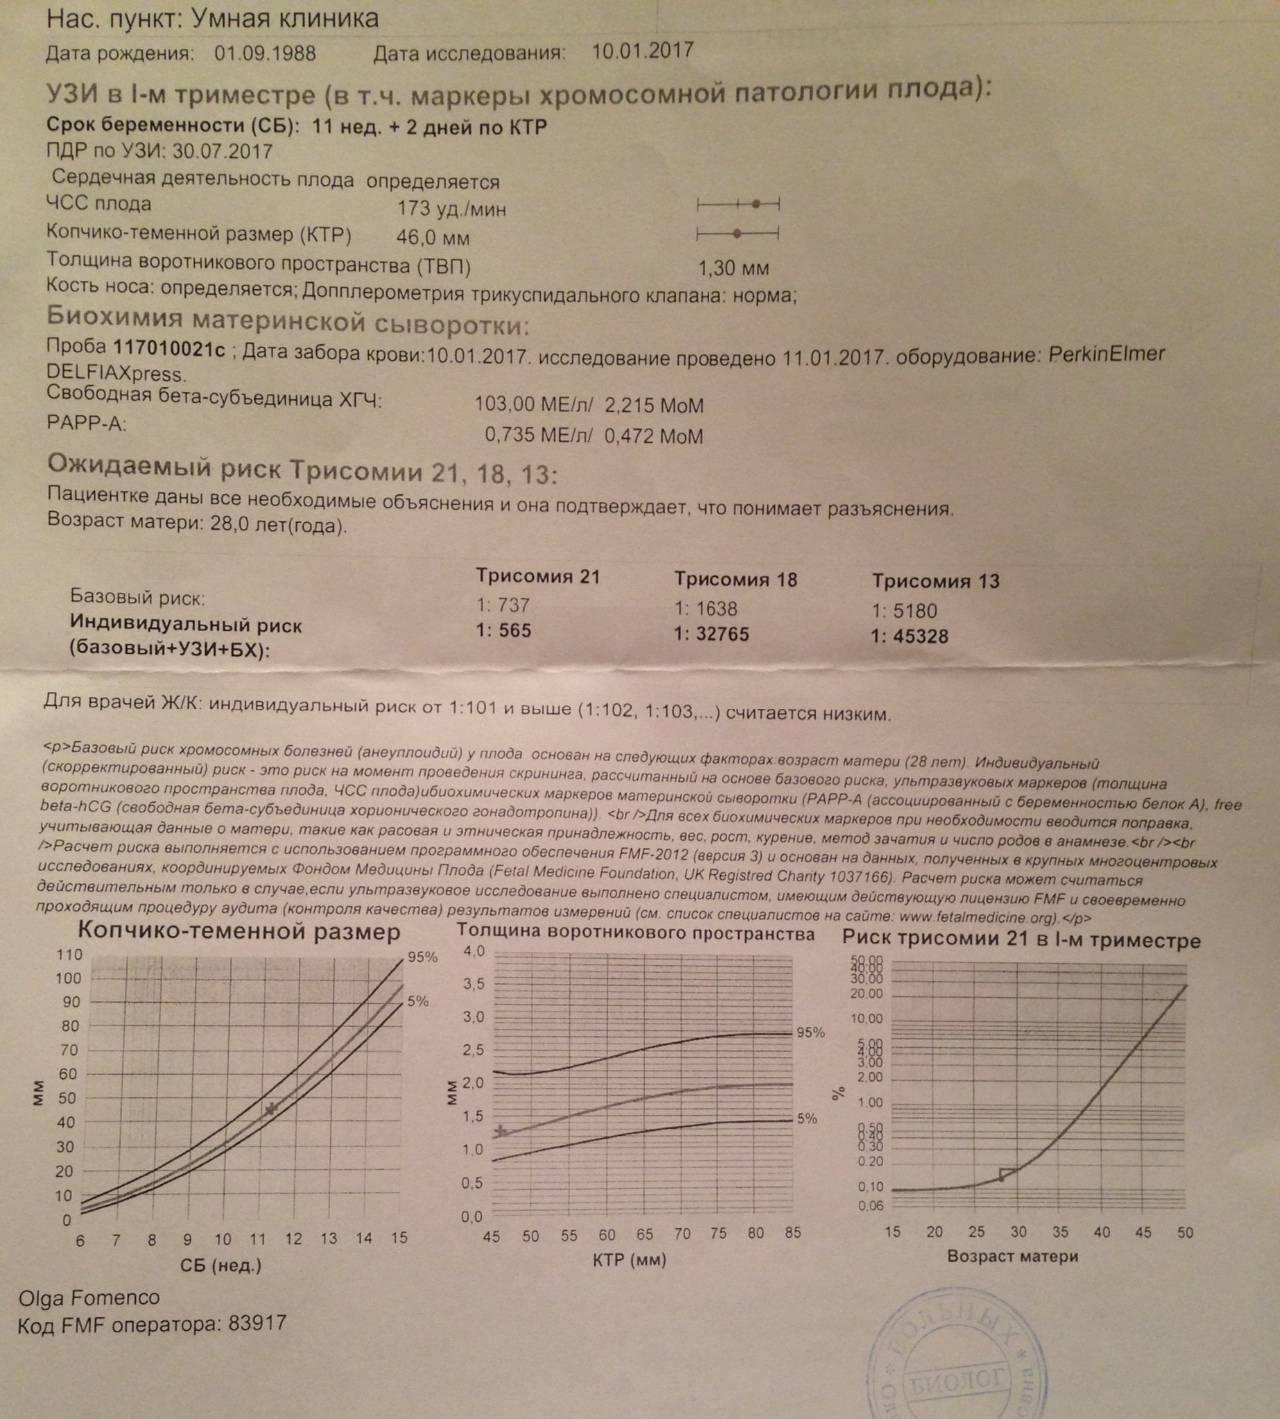 Онлайн калькулятор хгч: расшифровка анализа бета-хгч